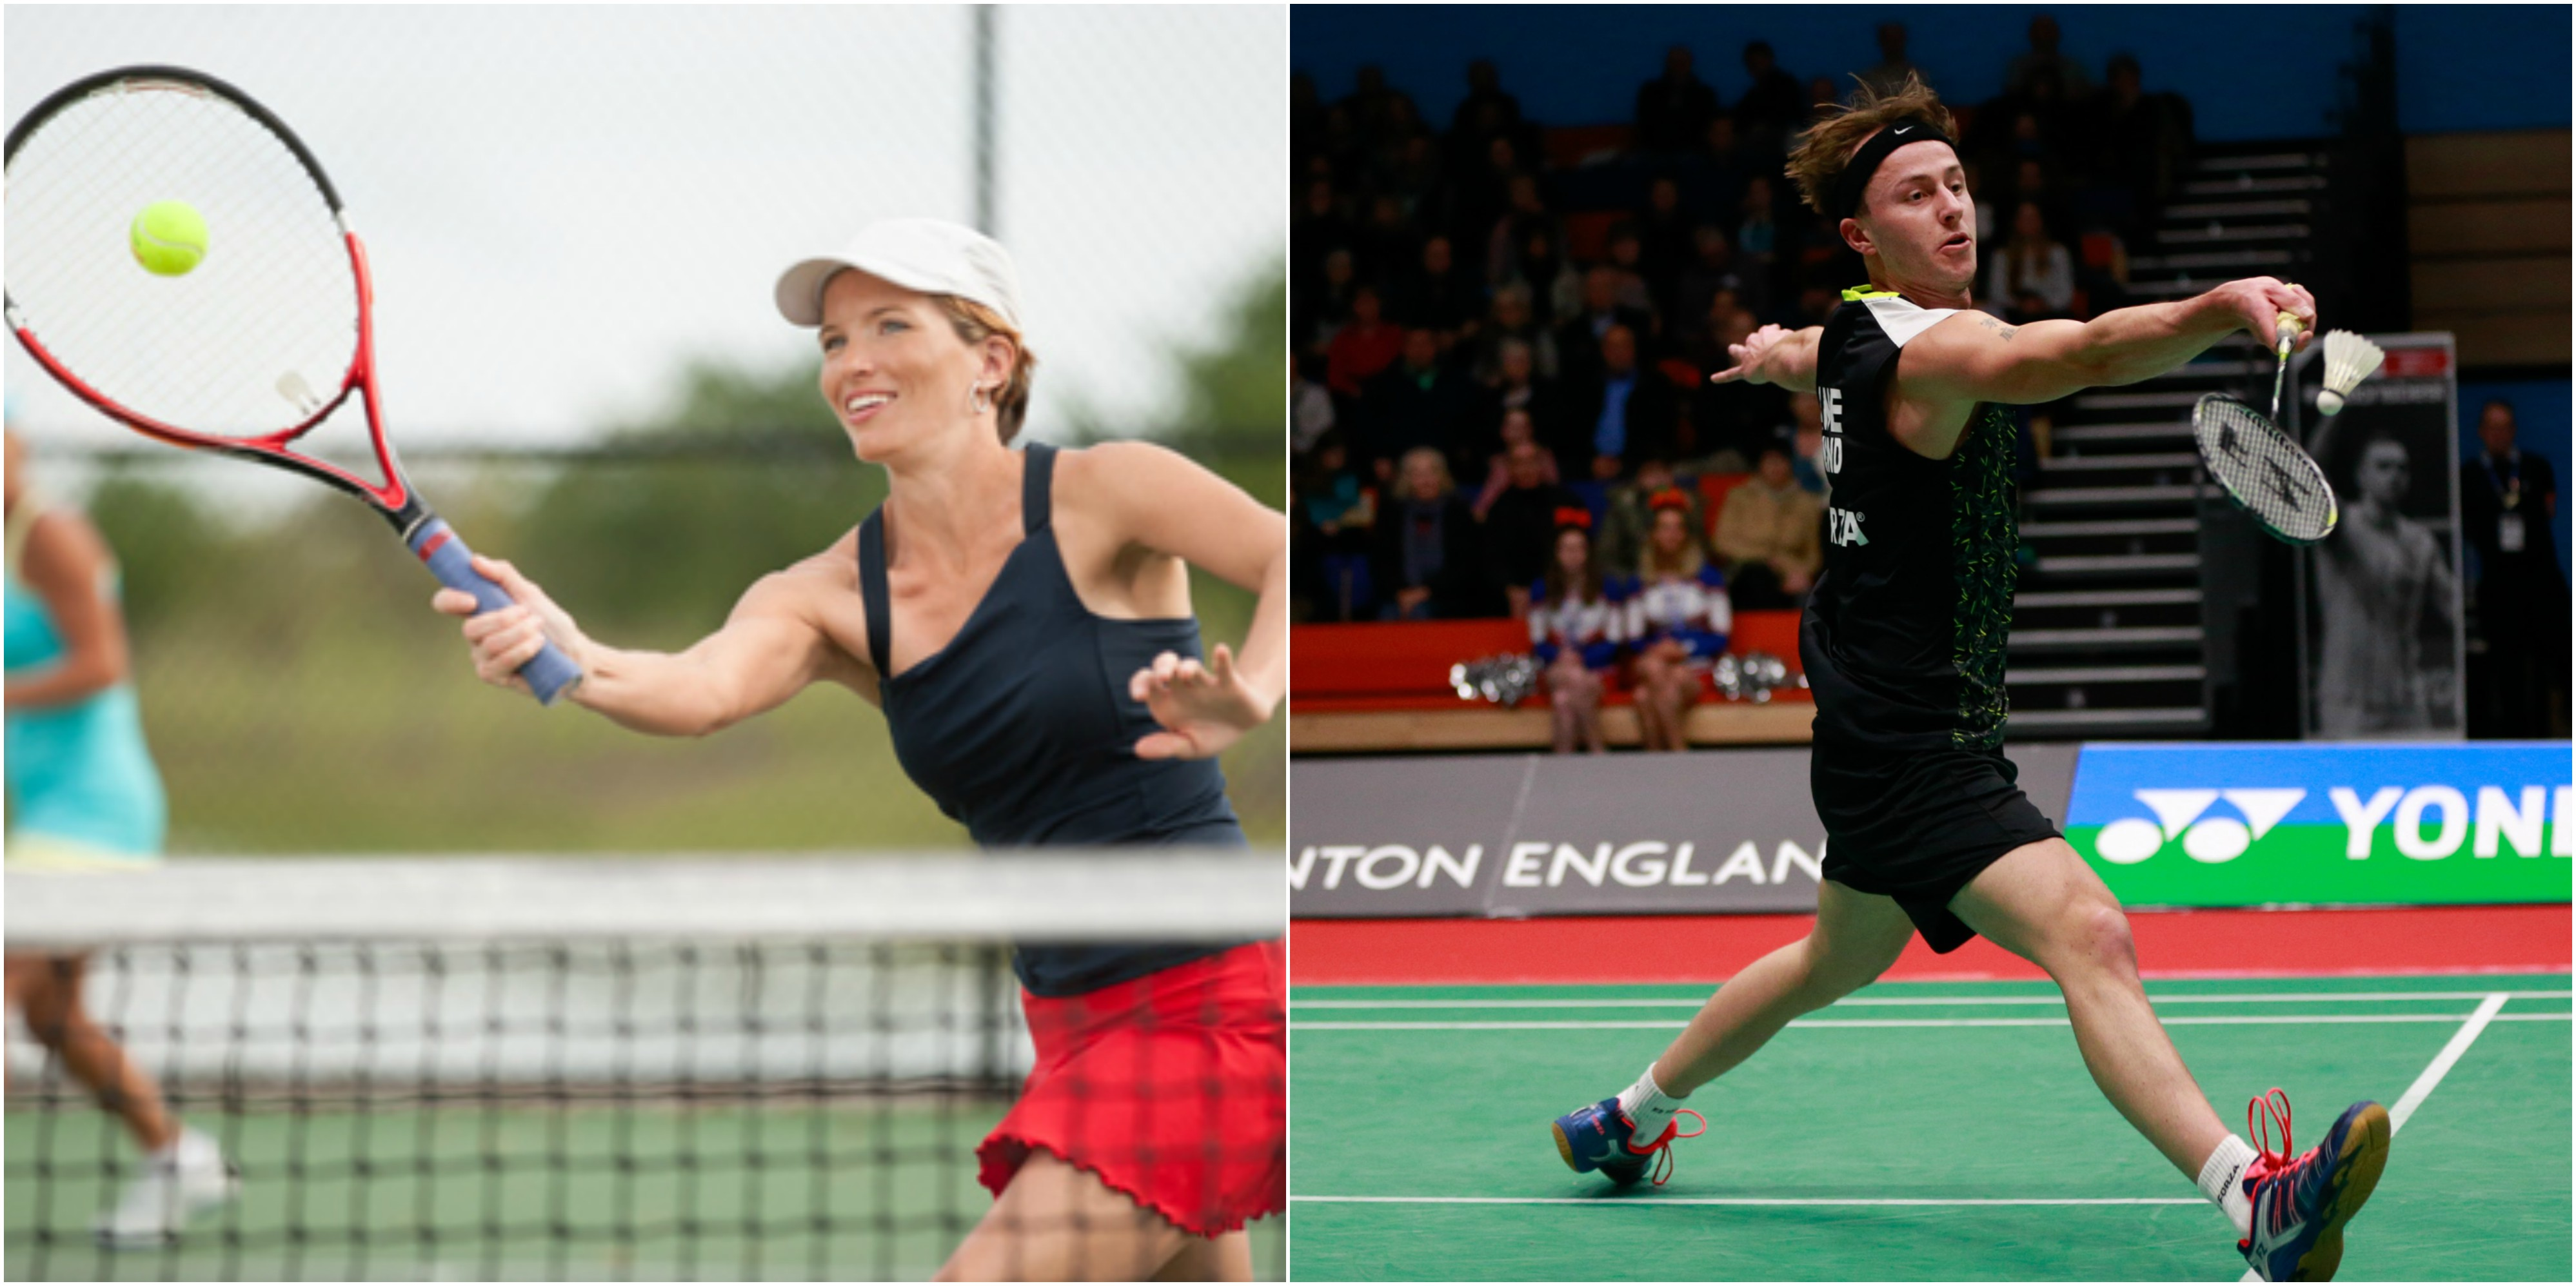 Tennis Vs Badminton: The Battle Of Racket Sports - Playo